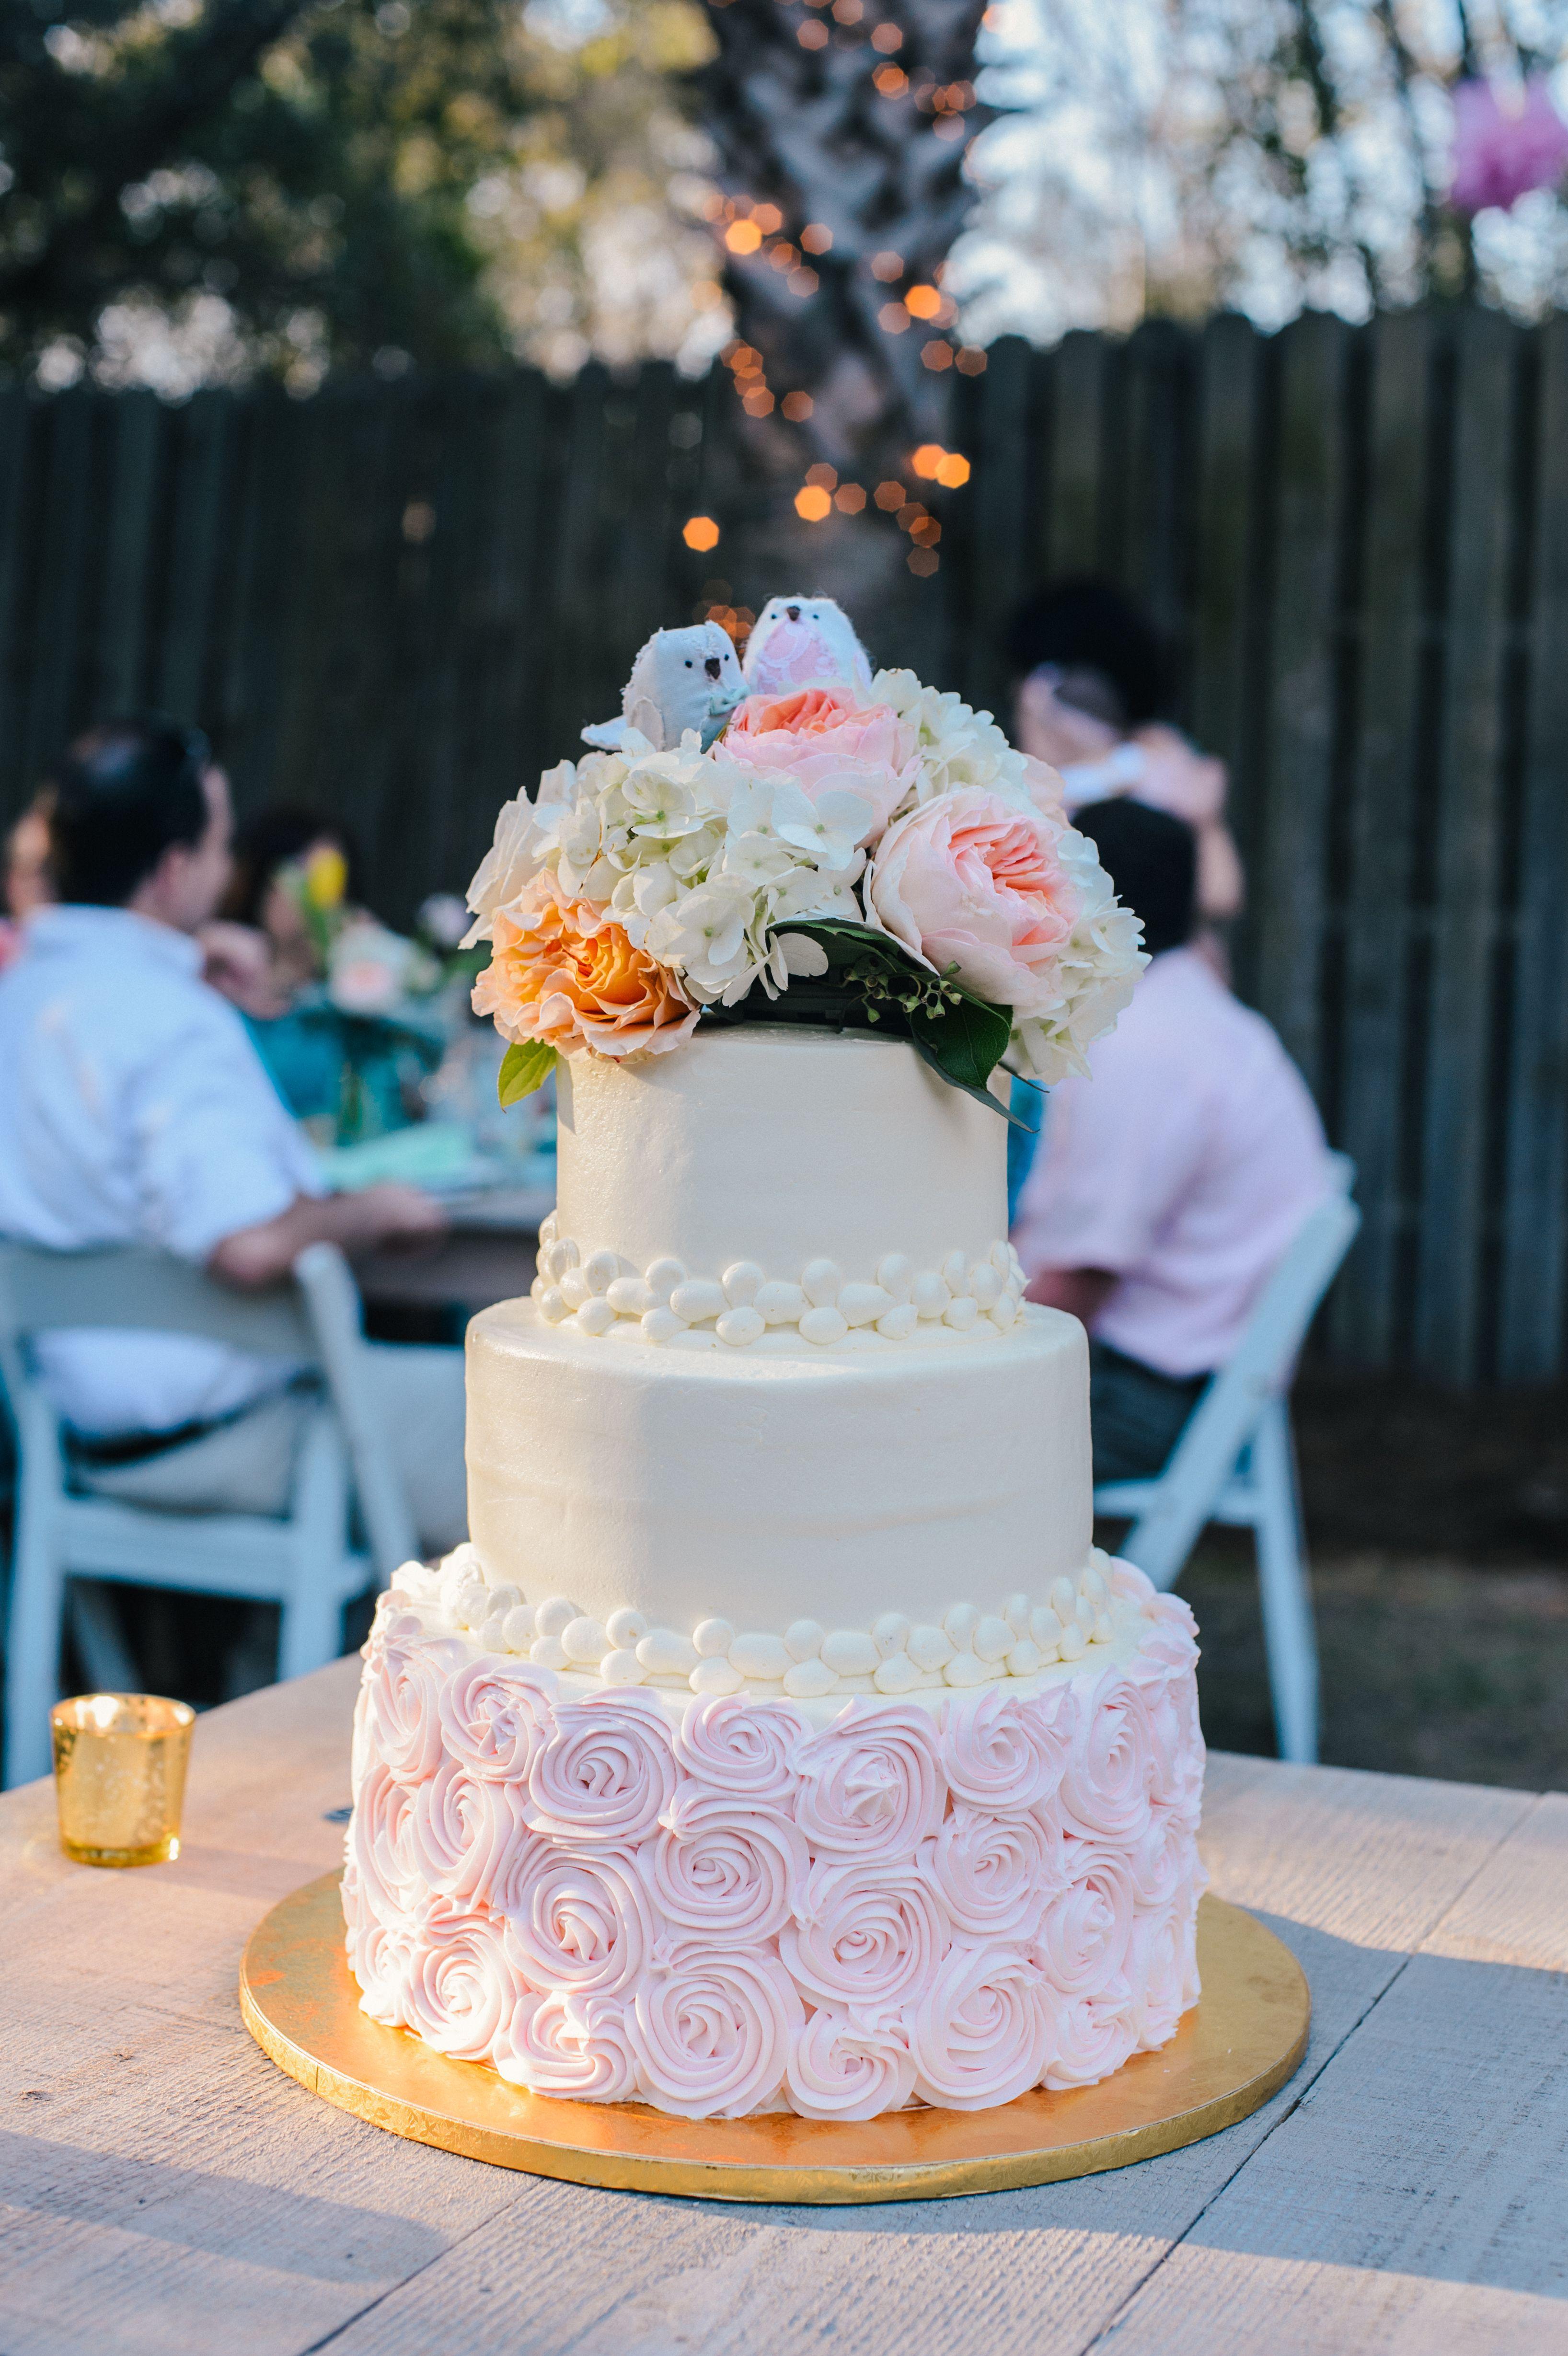 Pink rosetta wedding cake with love birds and peonies